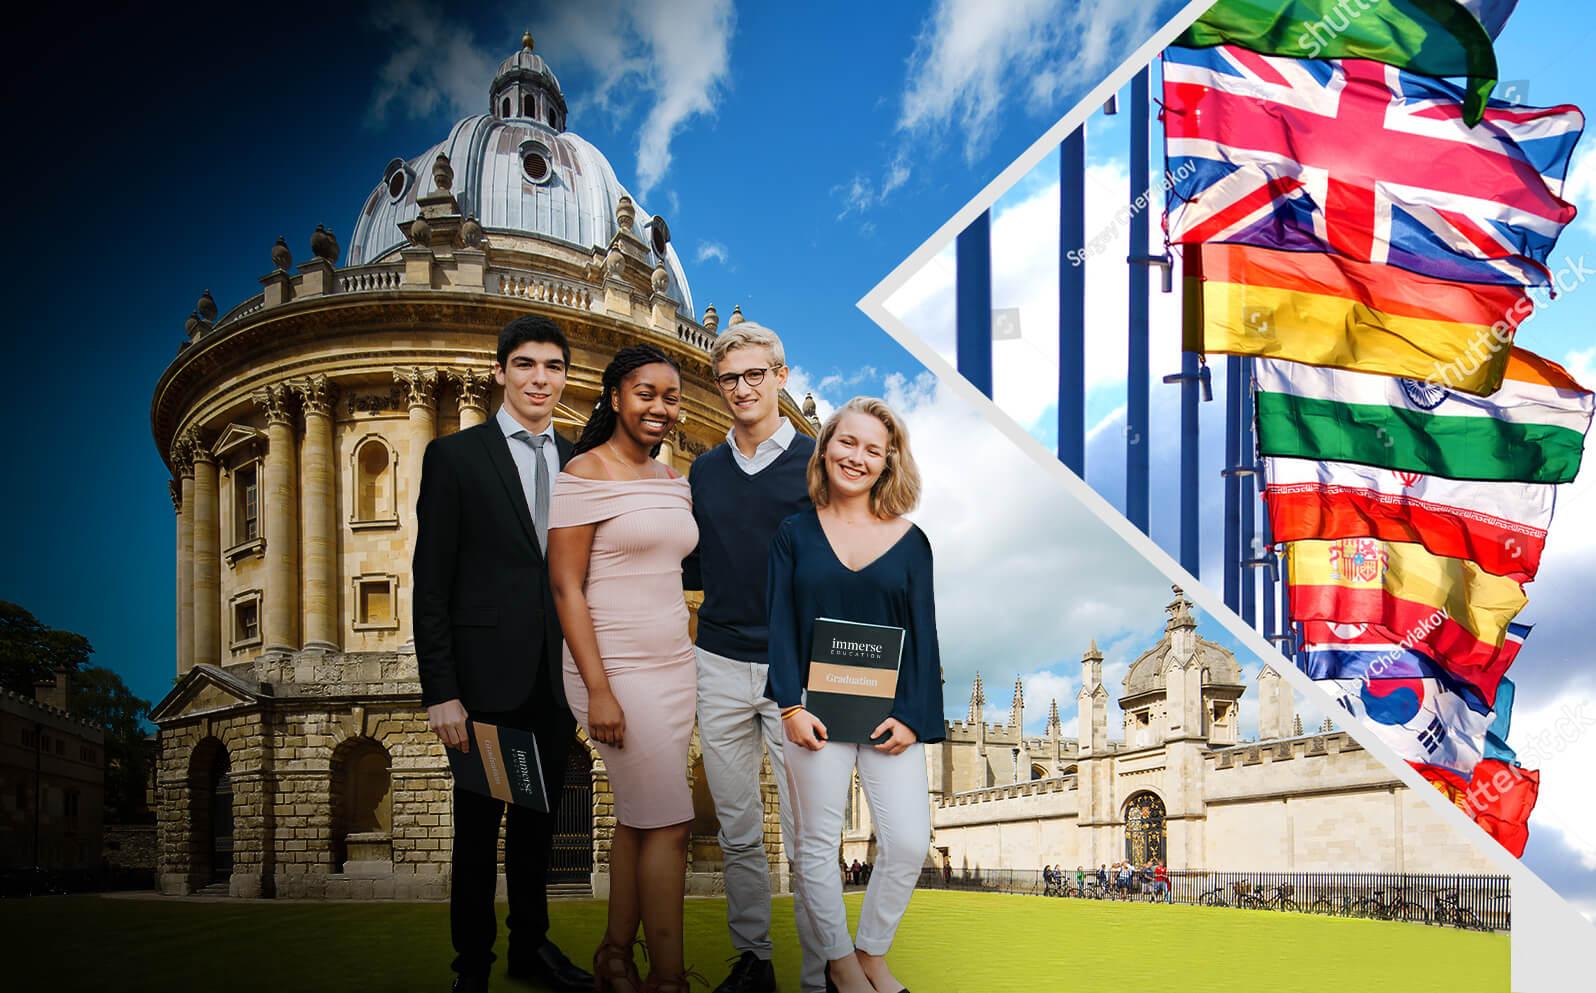 Oxford International Relations Summer Program for Ages 16-18